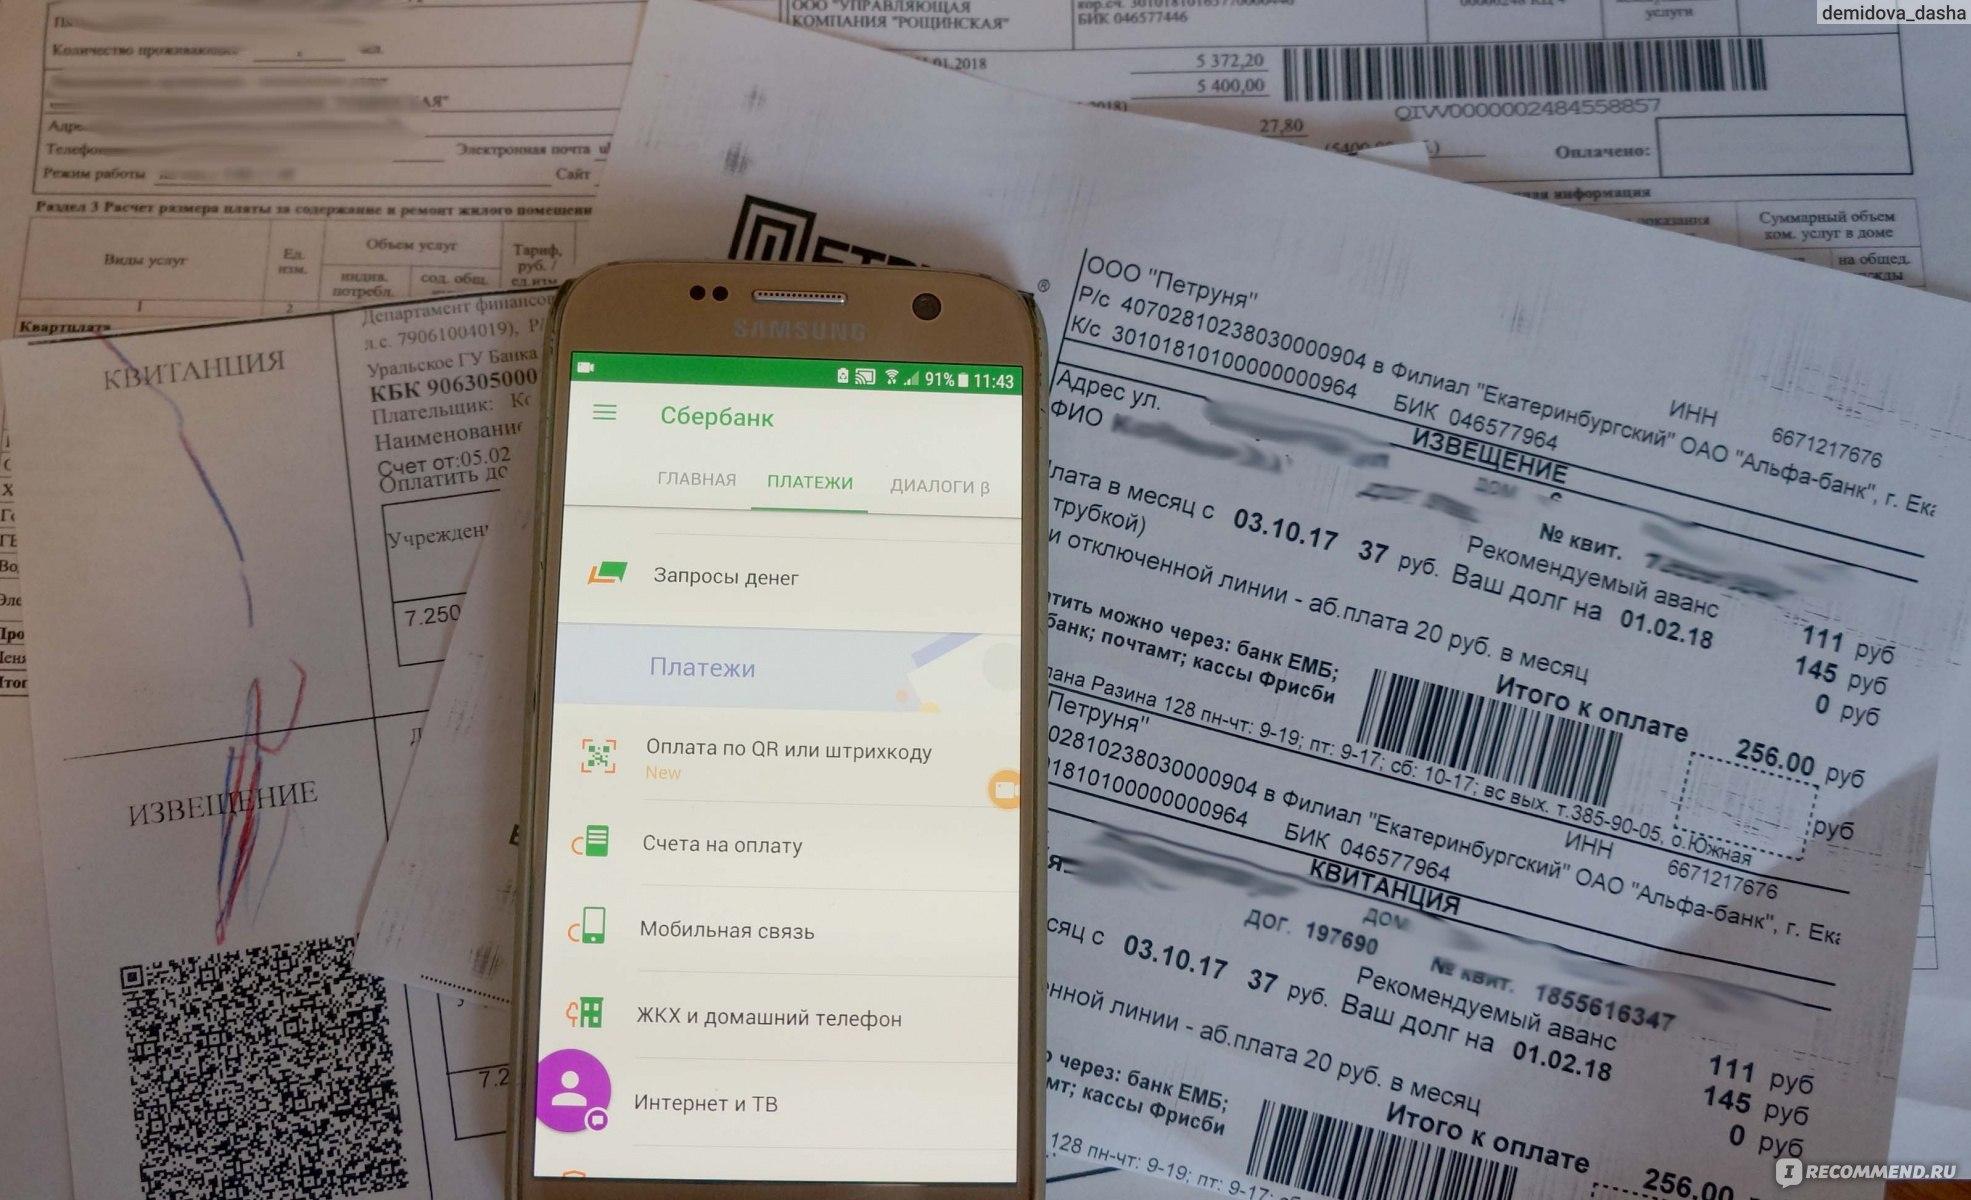 оплата квитанций сбербанк онлайн